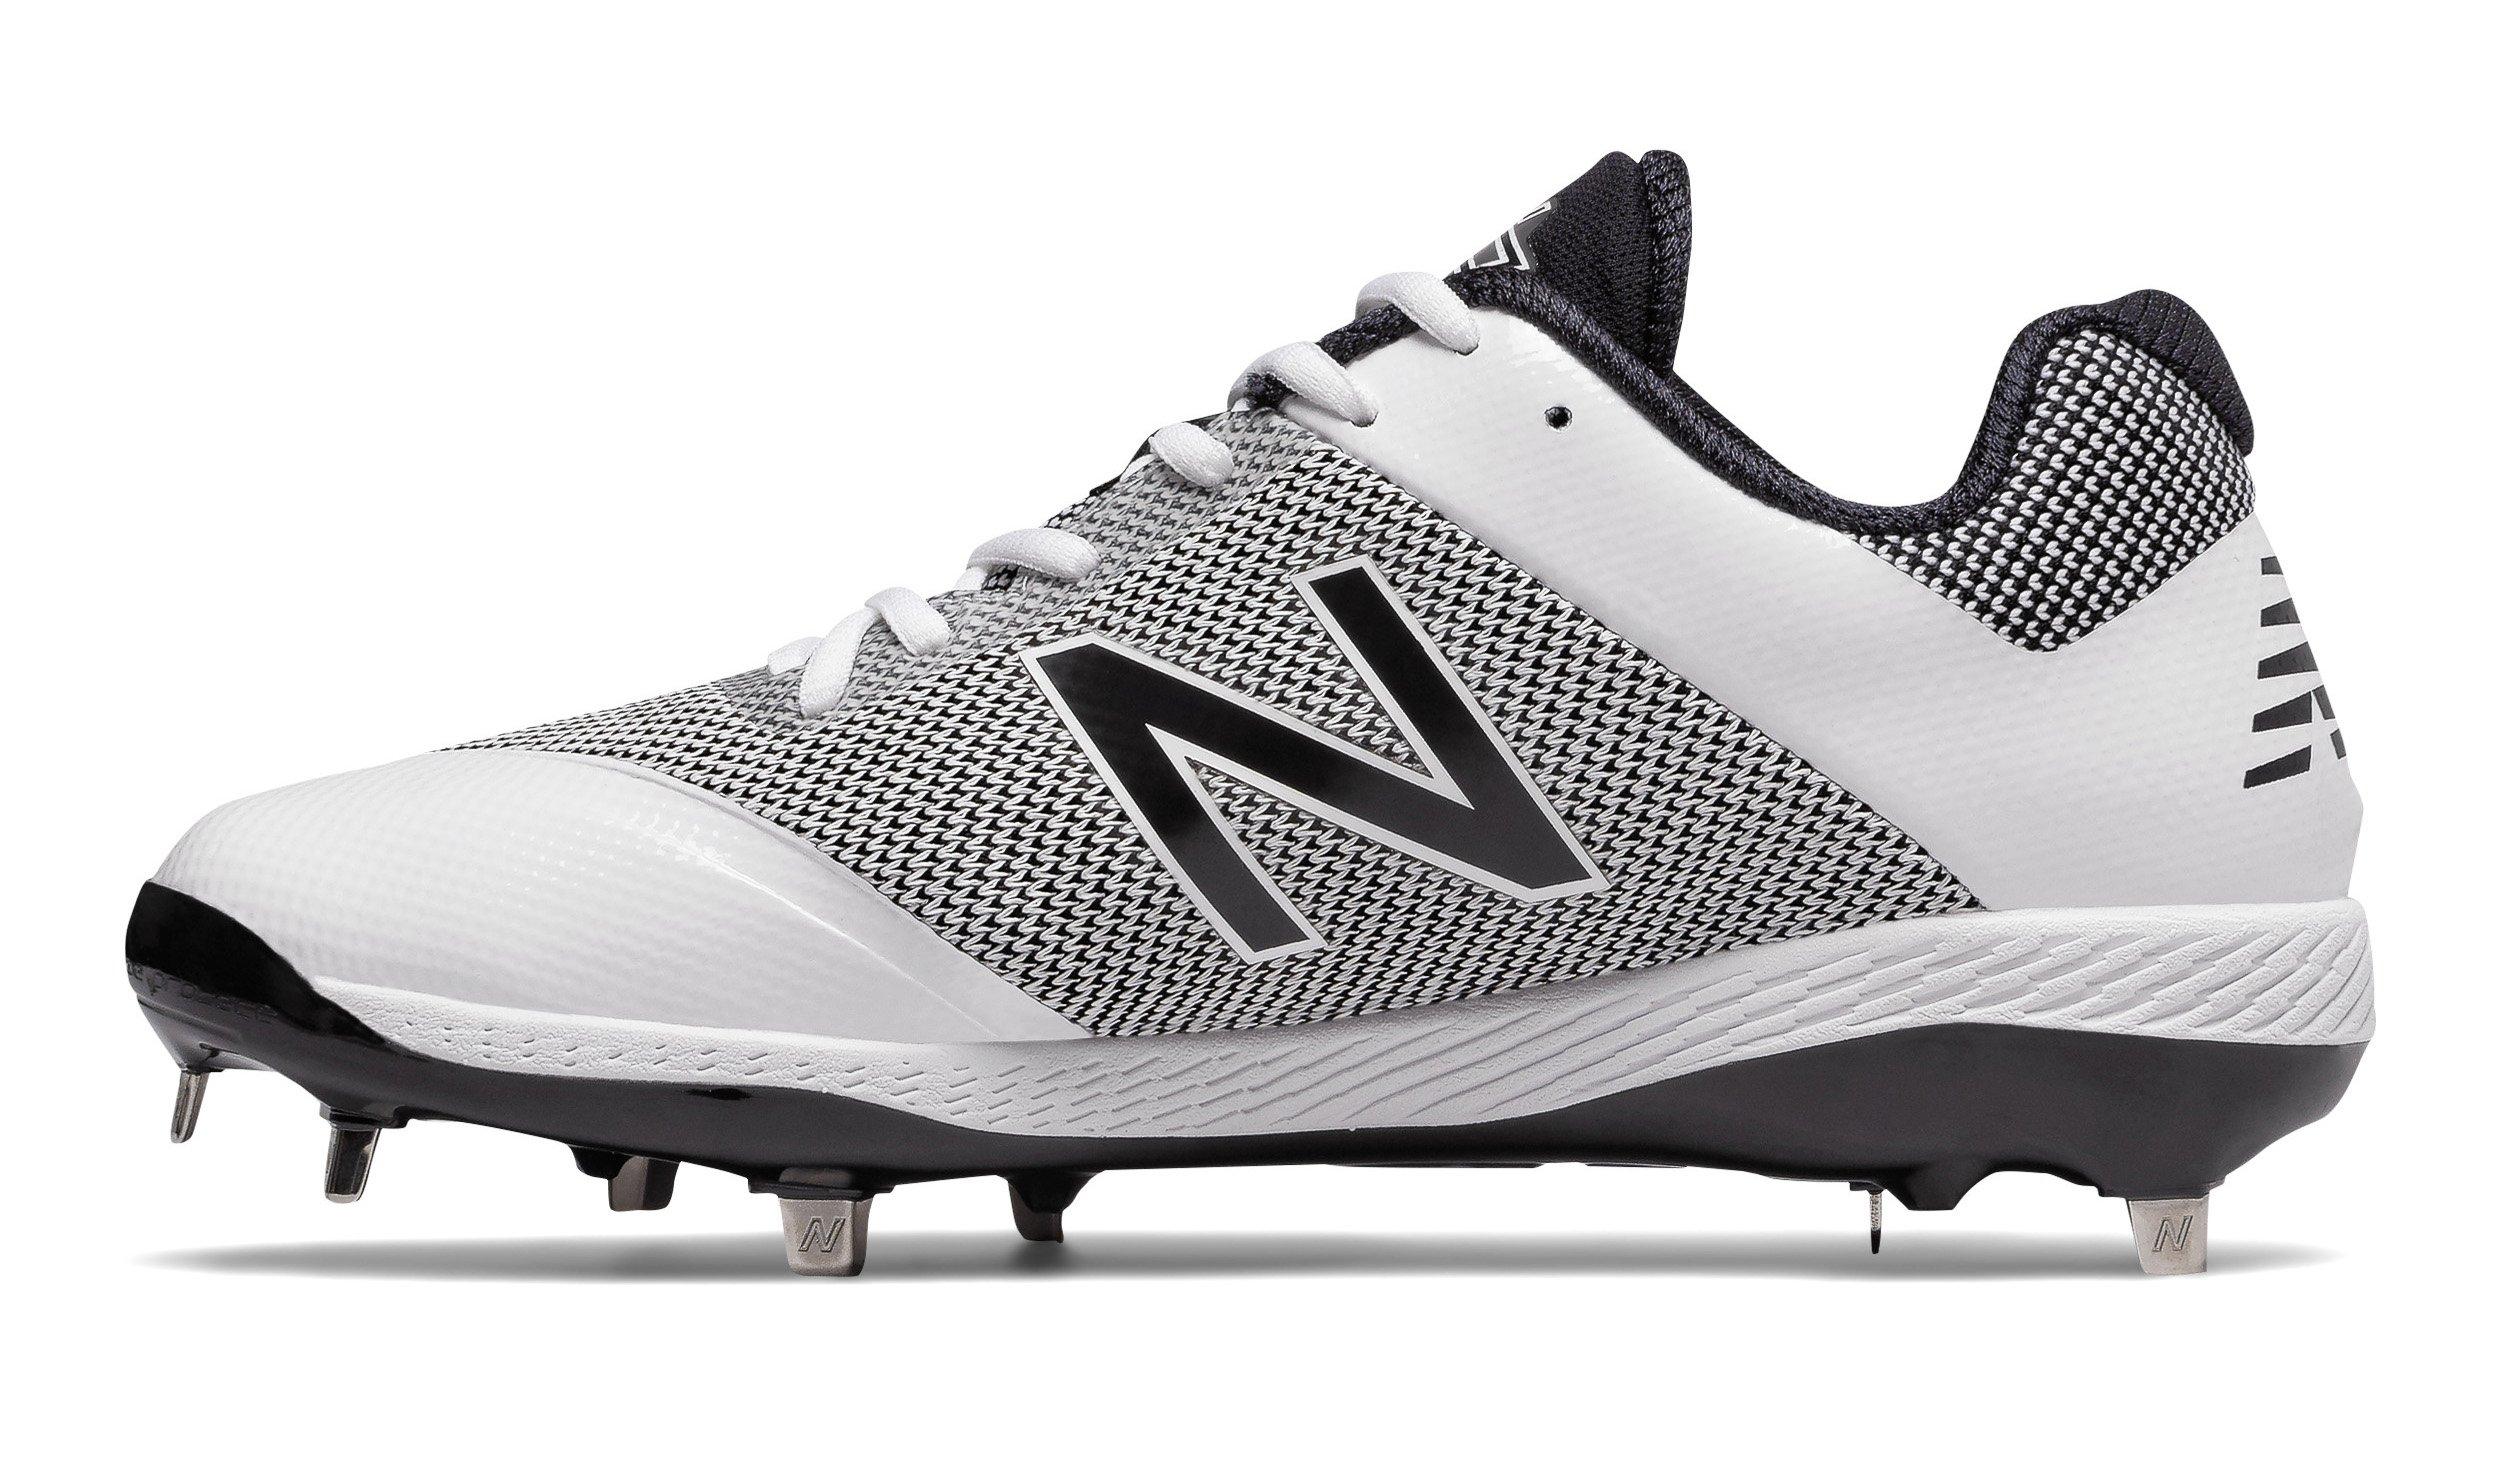 New Balance Men's L4040v4 Metal Baseball Shoe, Silver/Camo, 8 D US by New Balance (Image #2)